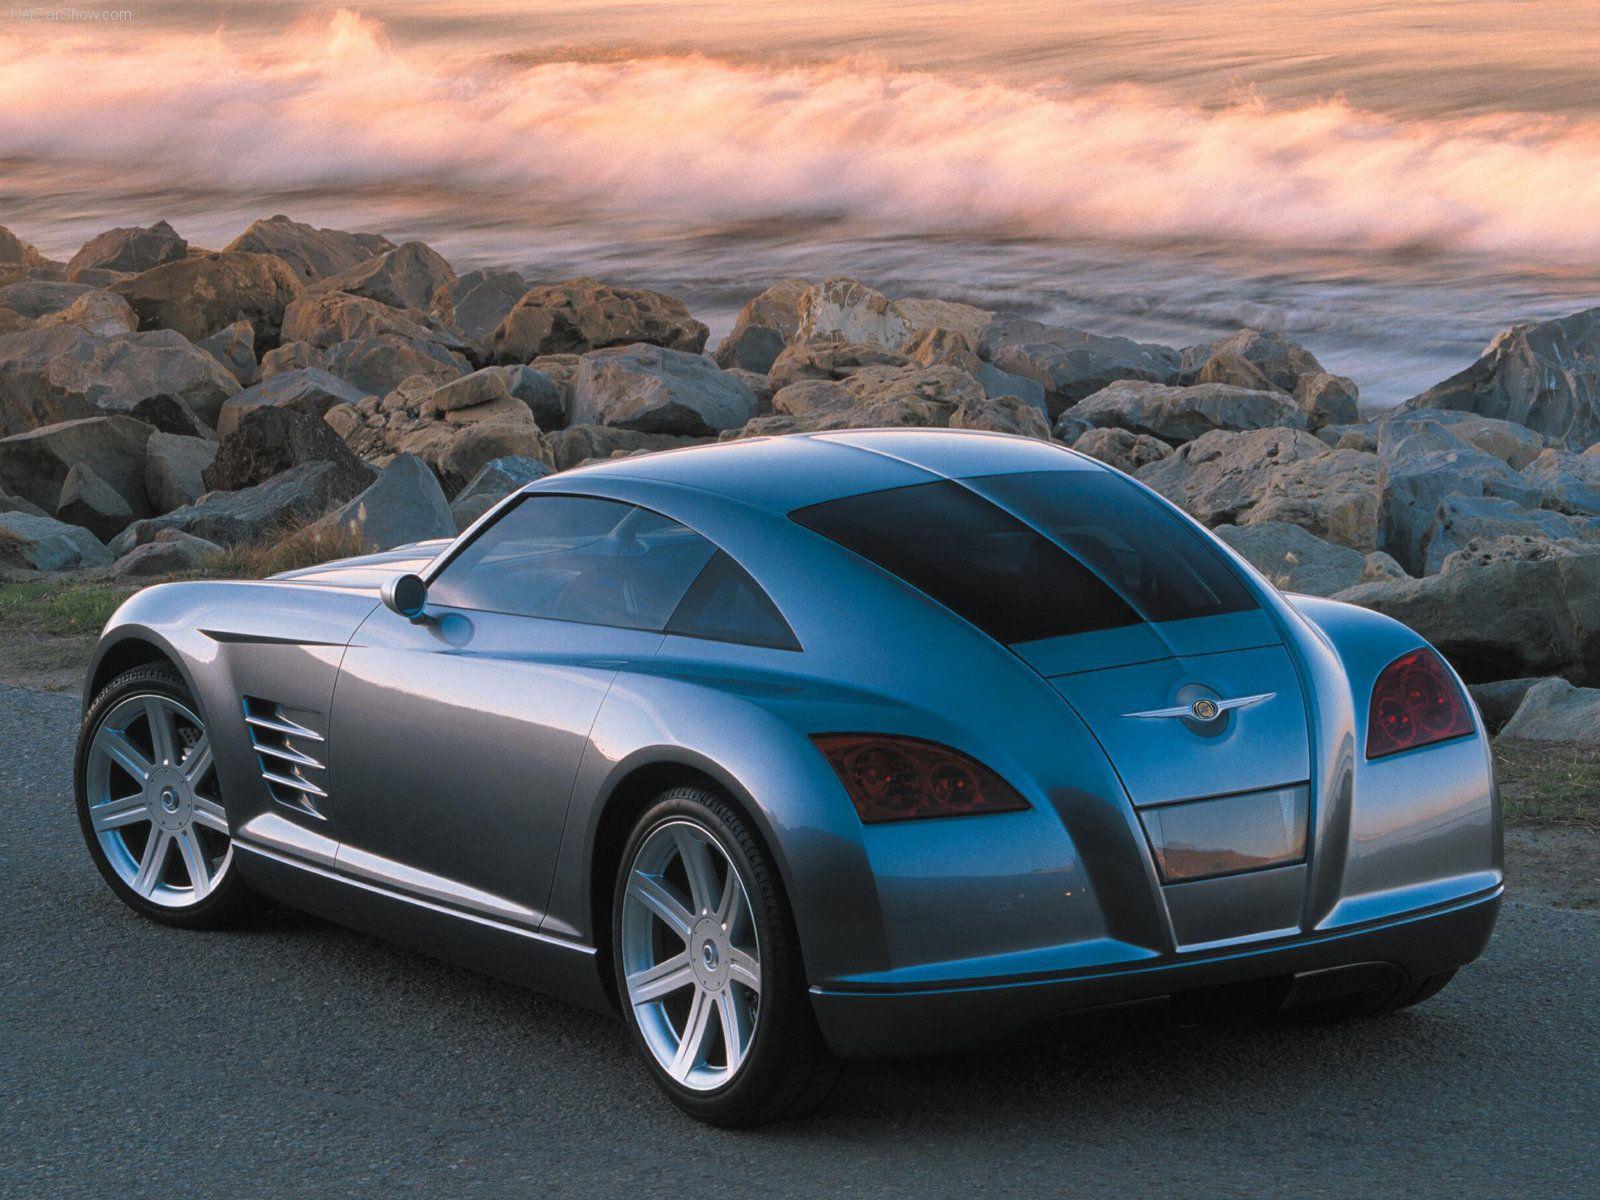 2001 Chrysler Crossfire Concept Photo 2 Auto Veicoli Storico